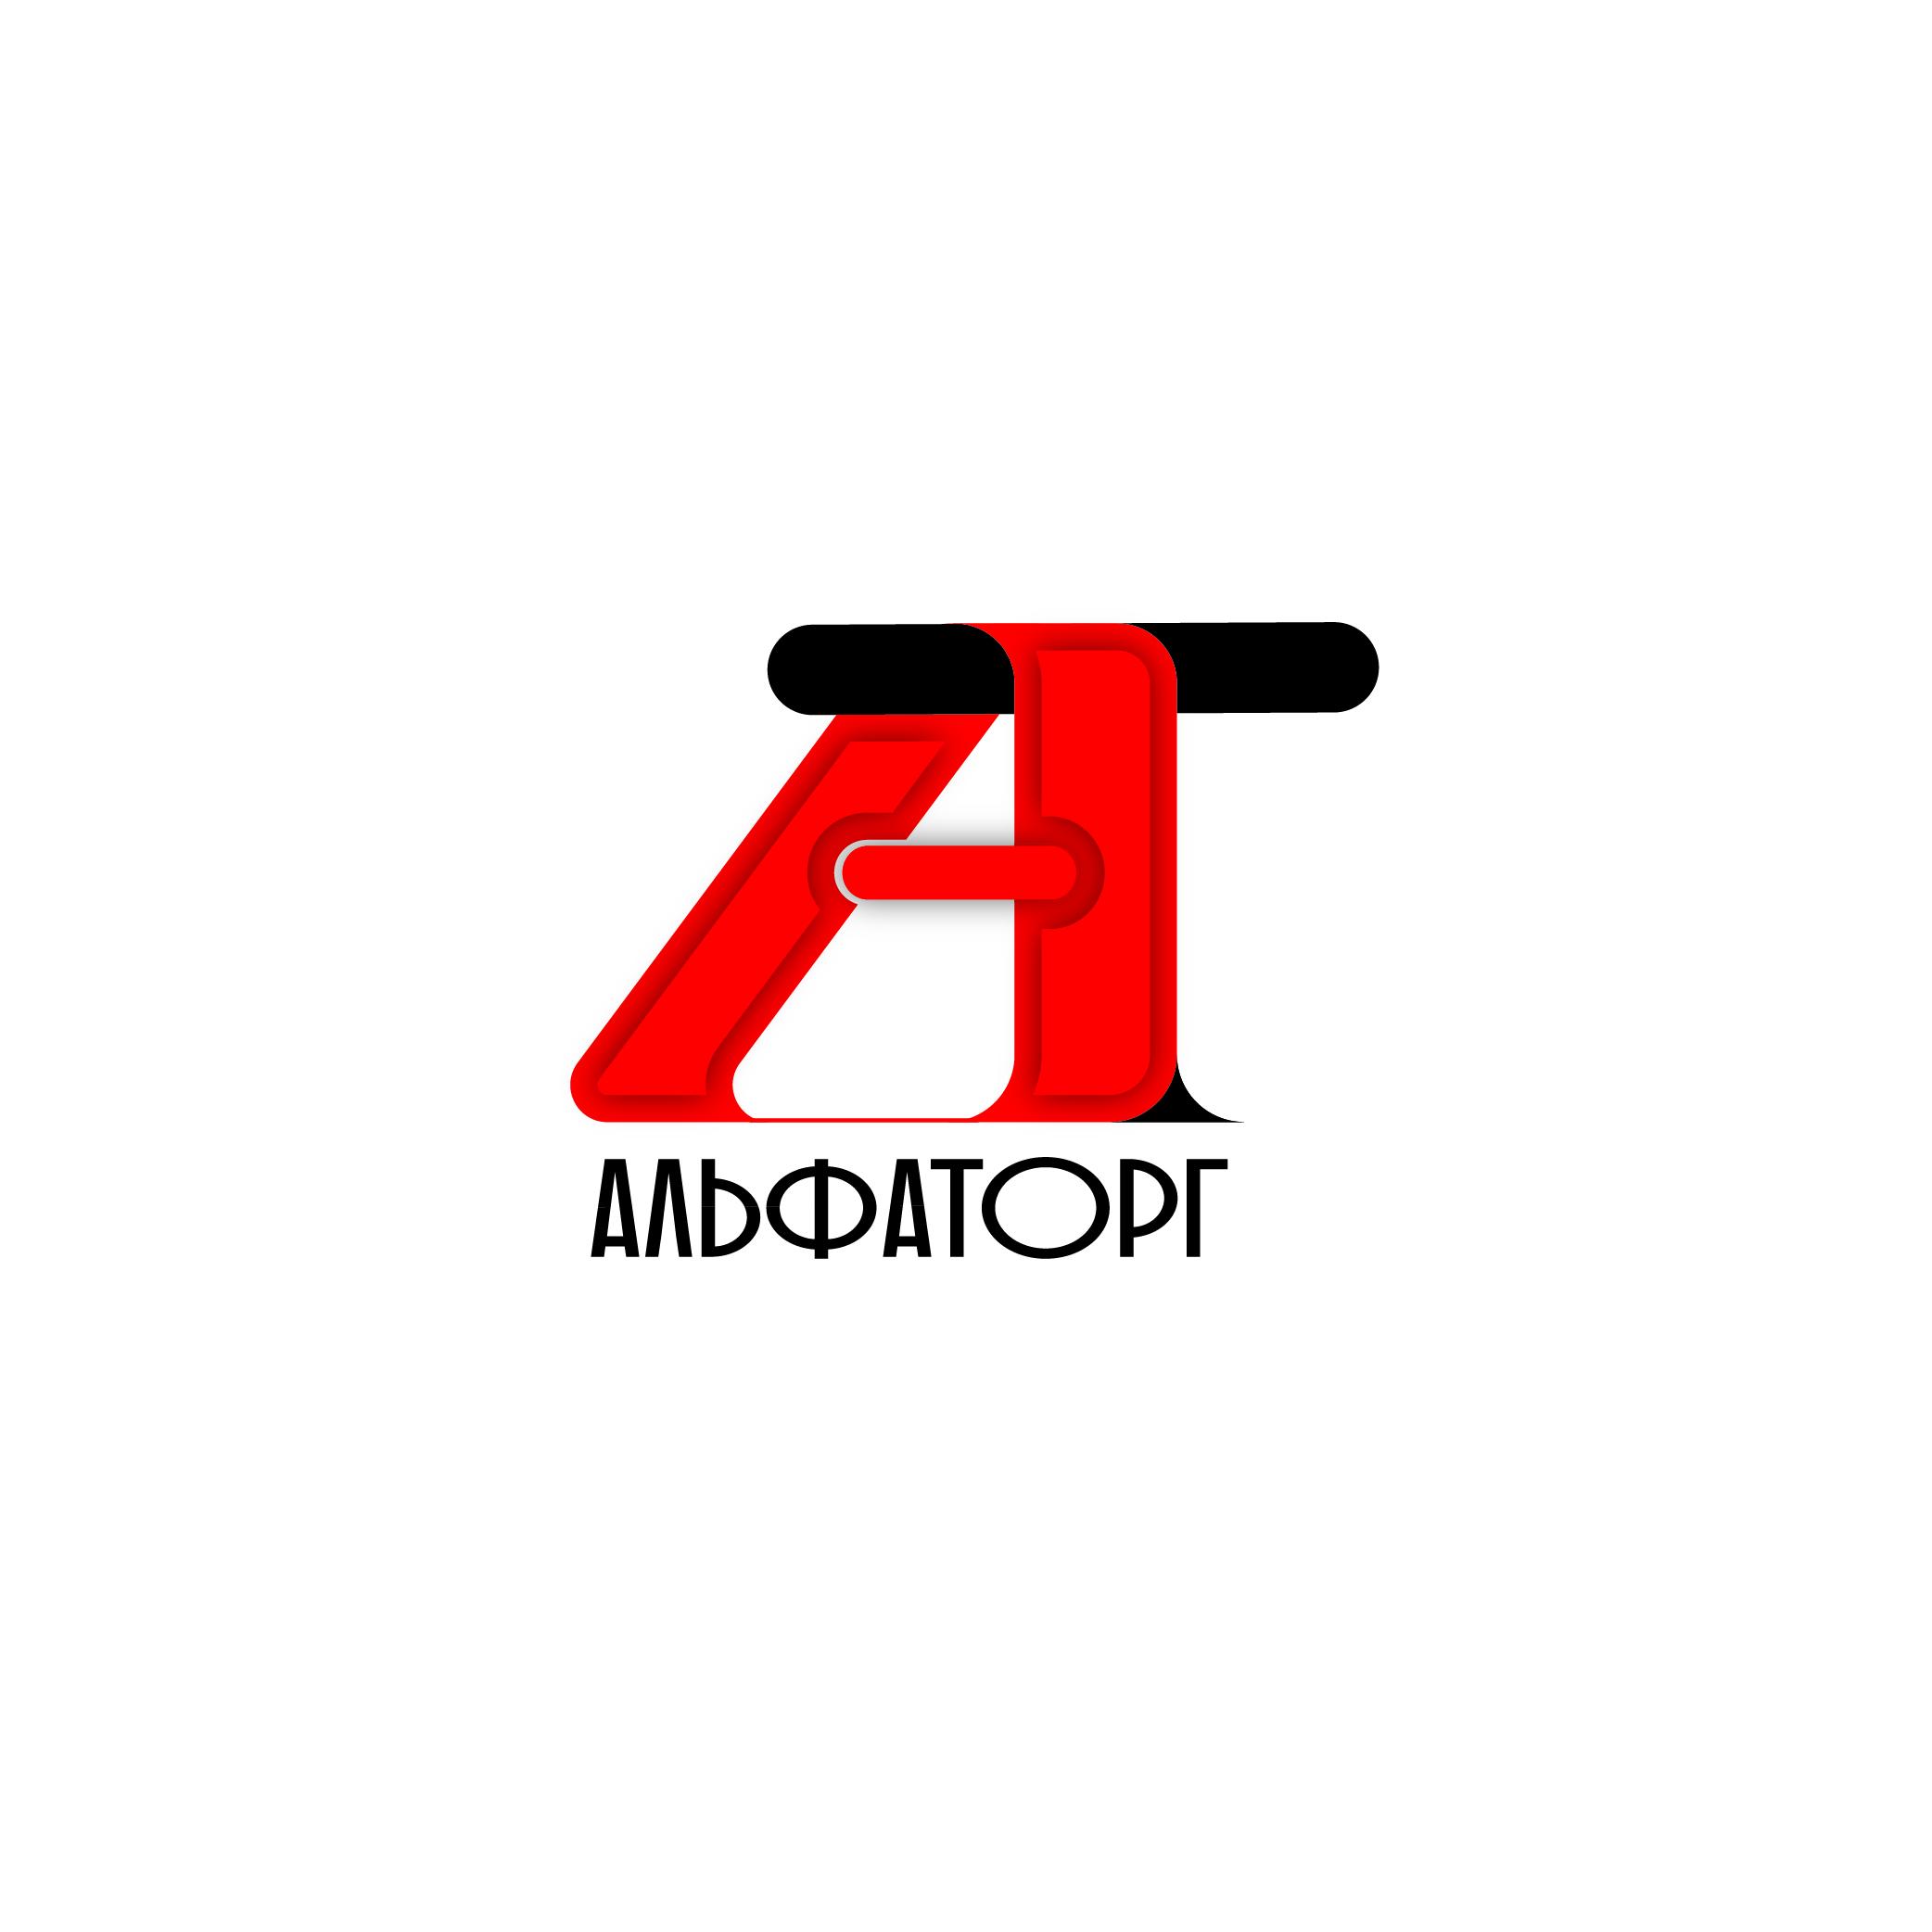 Логотип и фирменный стиль фото f_7565ef8a90a12fba.jpg